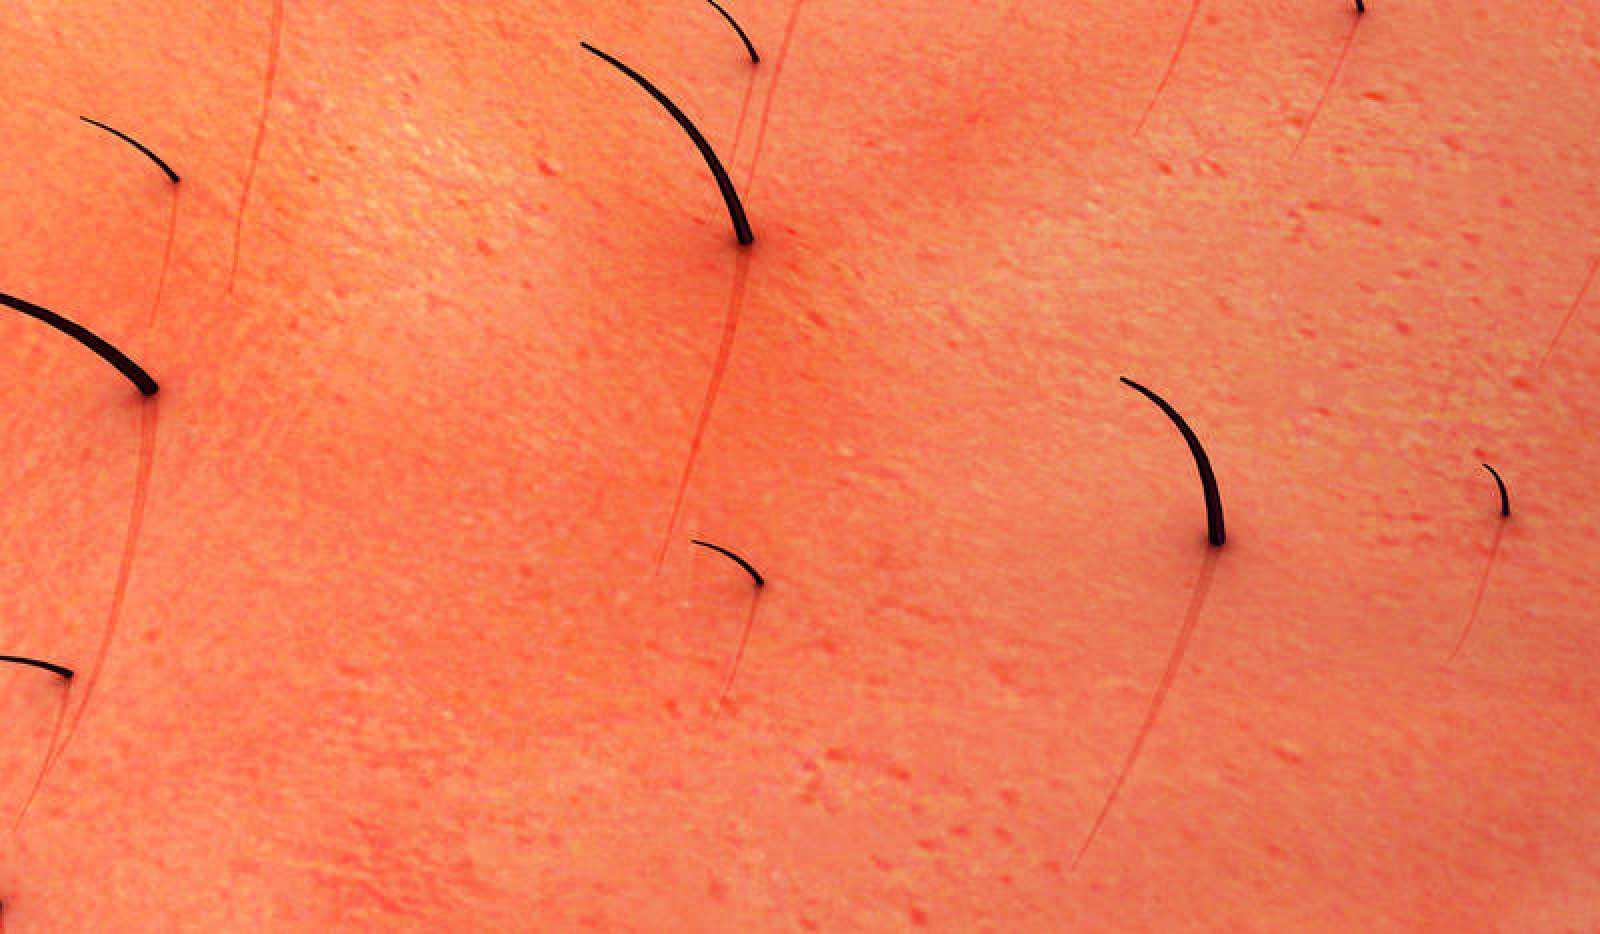 La piel vellosa se ha producido a partir de células madre pluripotentes de ratón.